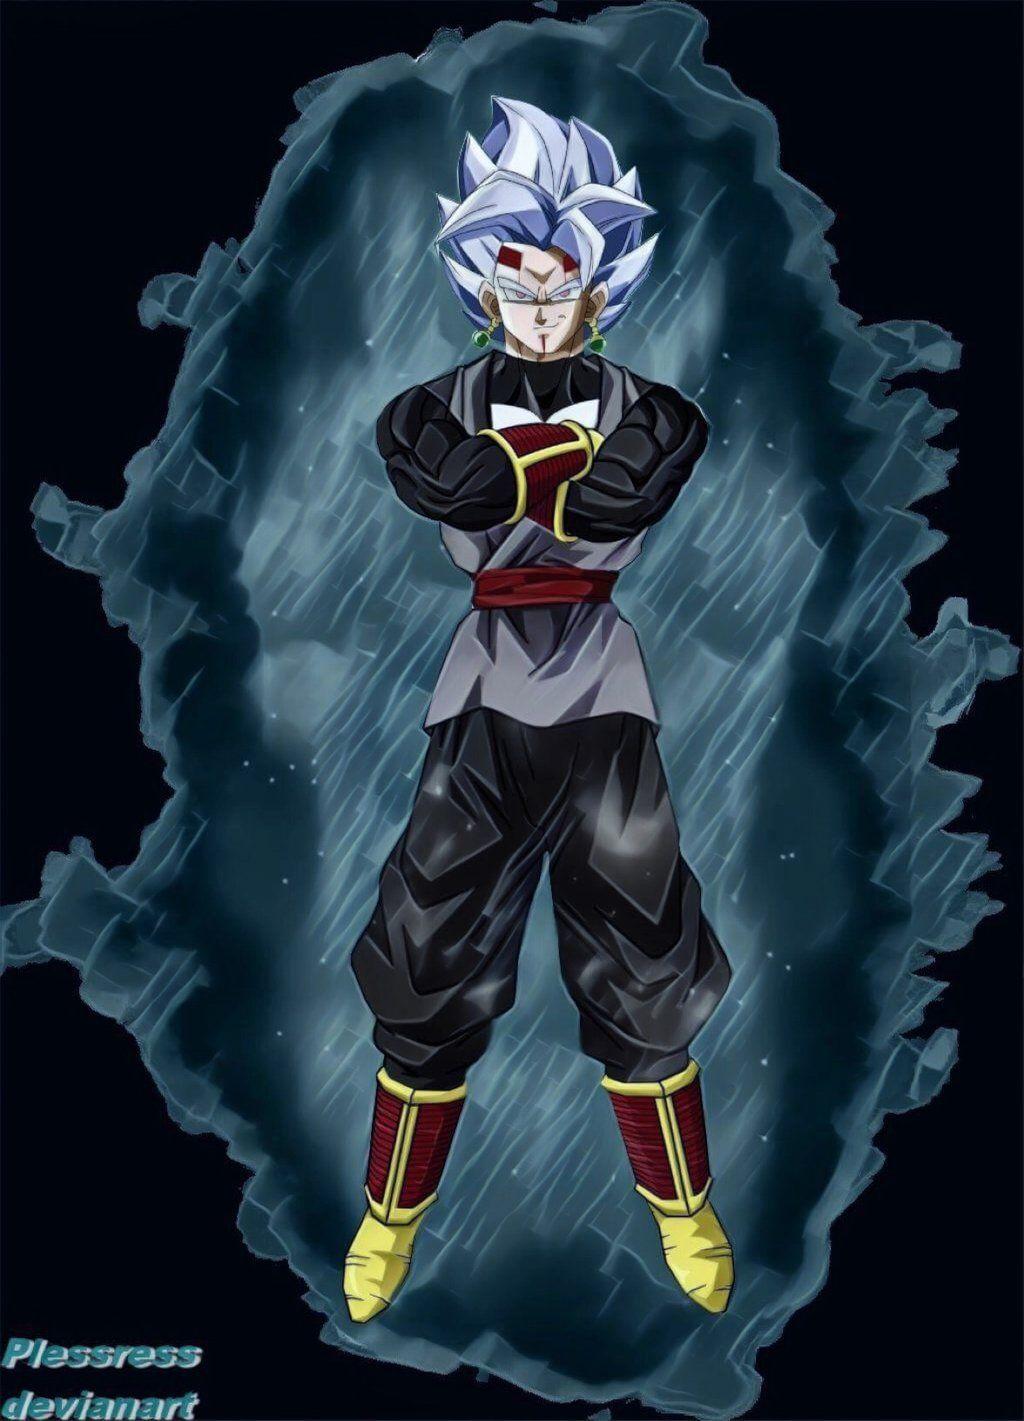 Dragonball Baby Vegeta Goku Black Fusion By Plessress Anime Dragon Ball Super Dragon Ball Super Manga Goku Black